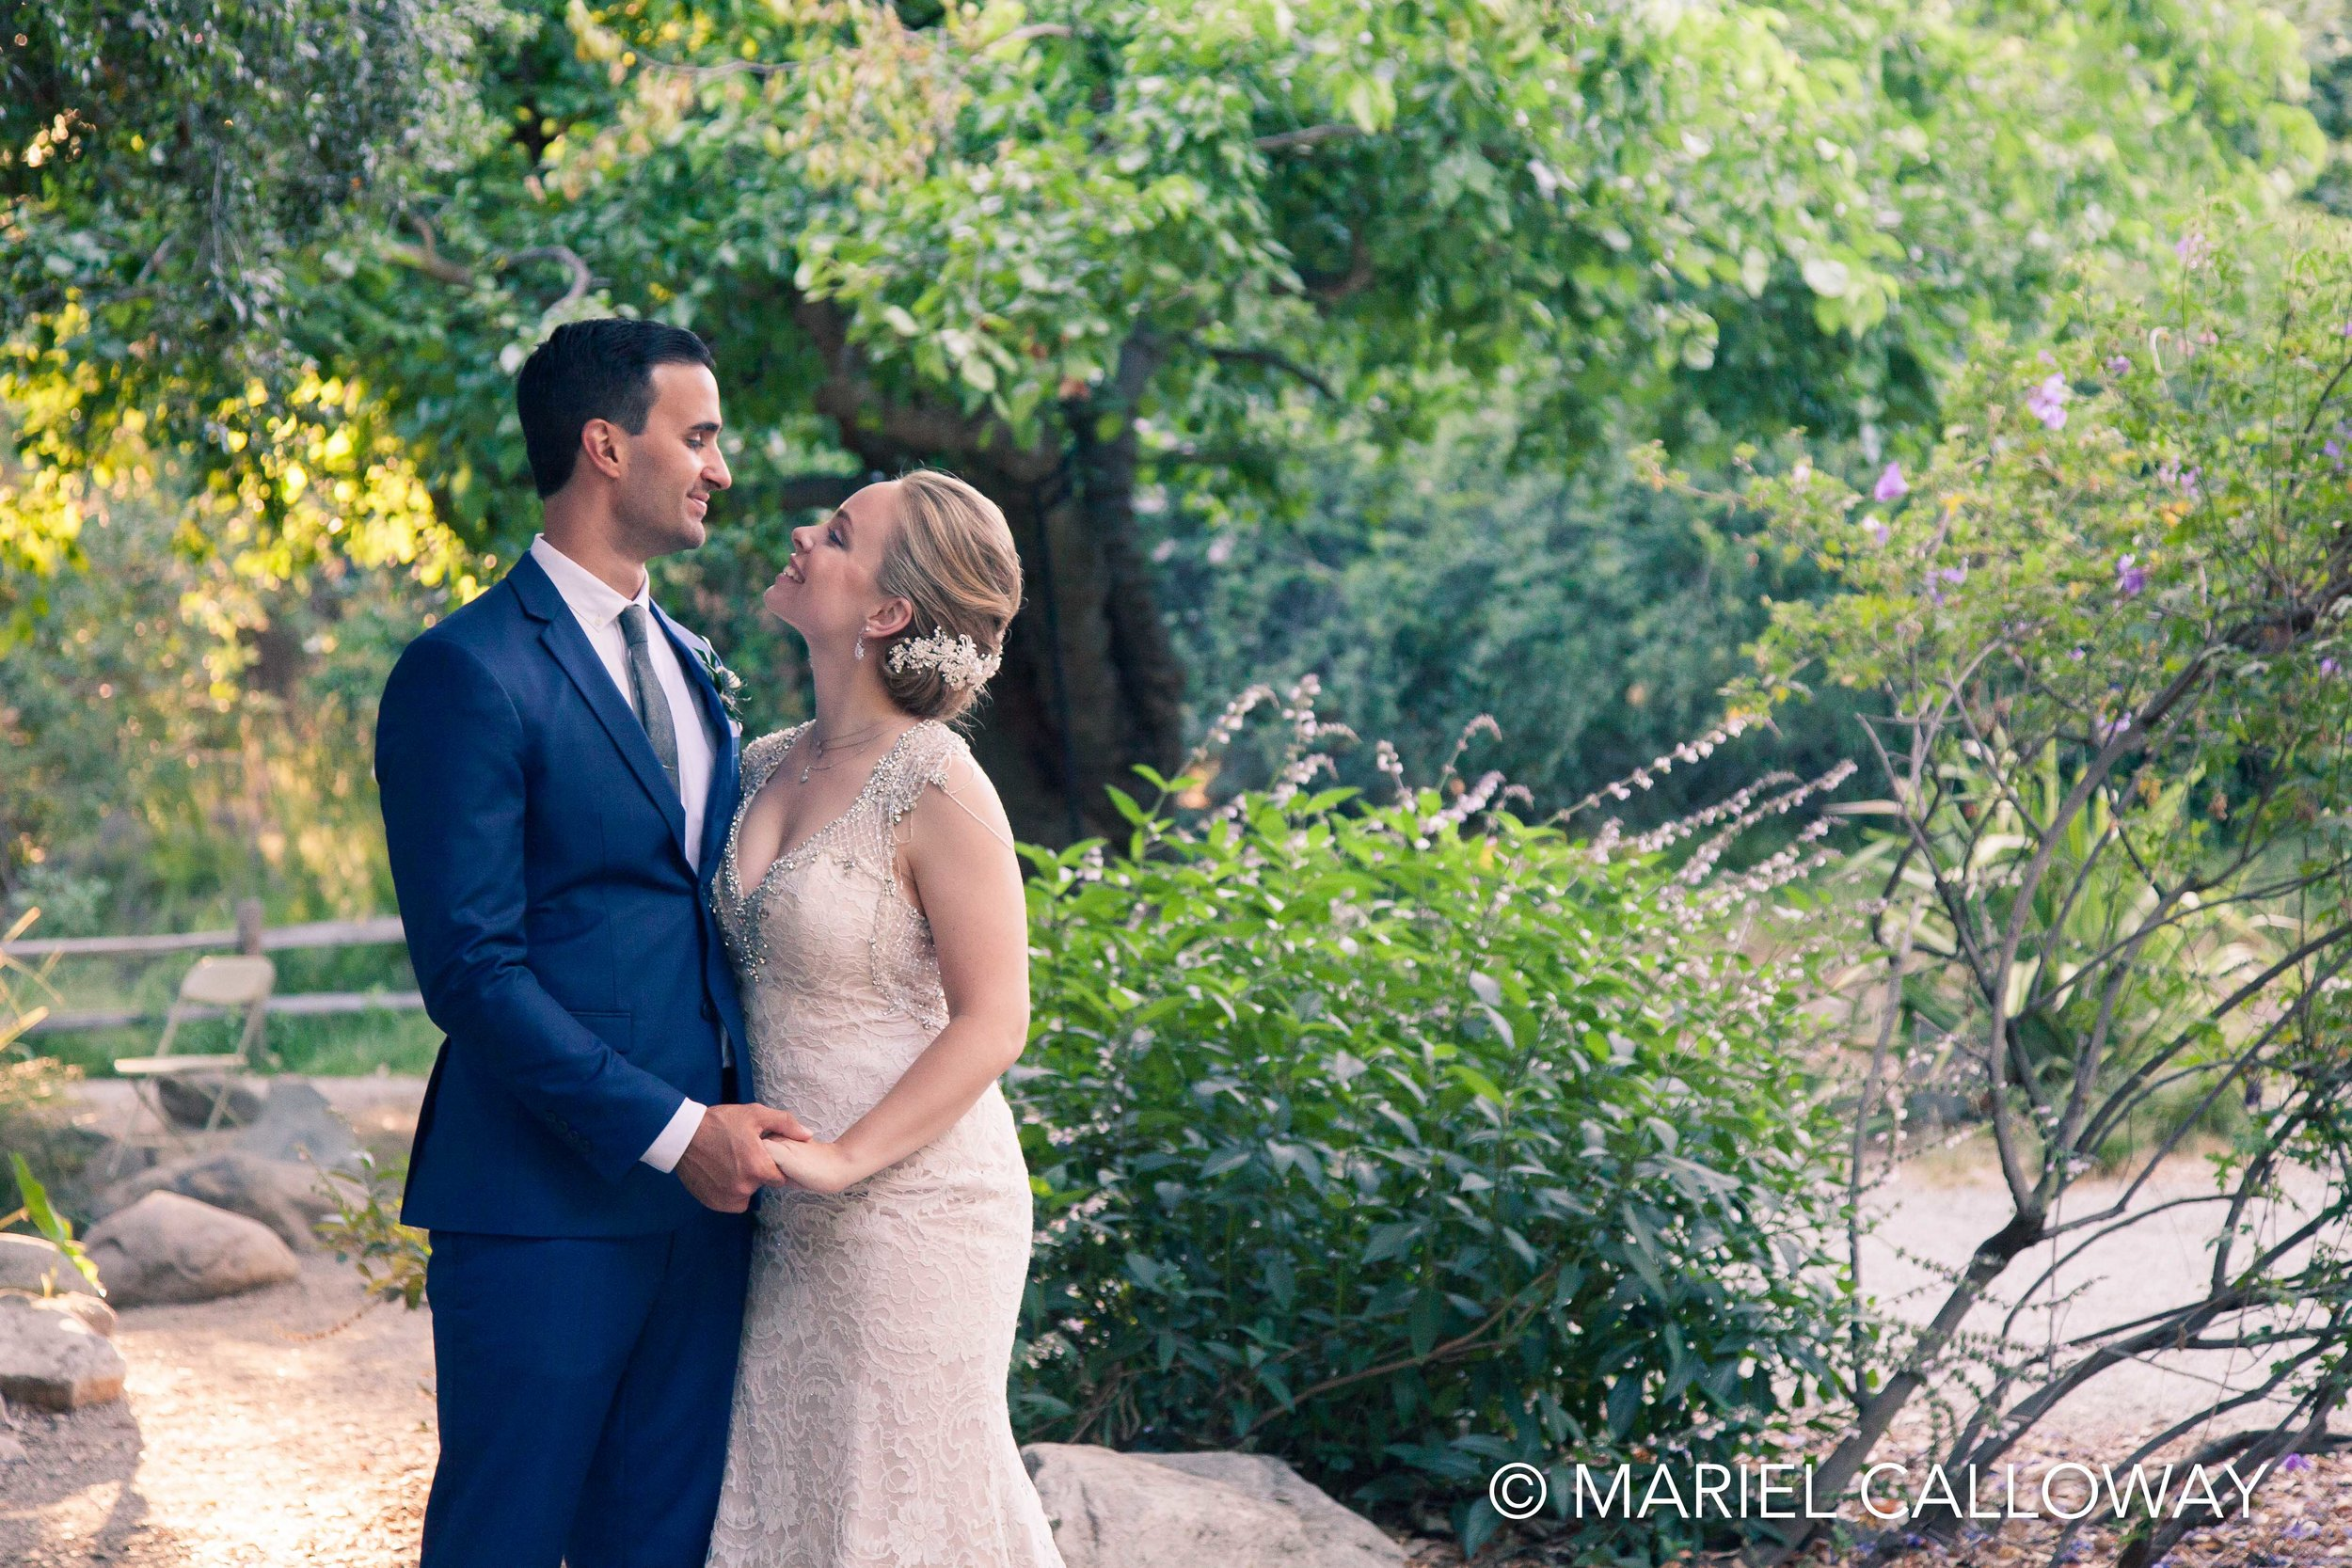 Mariel-Calloway-Los-Angeles-Wedding-Photography-Smith-36.jpg